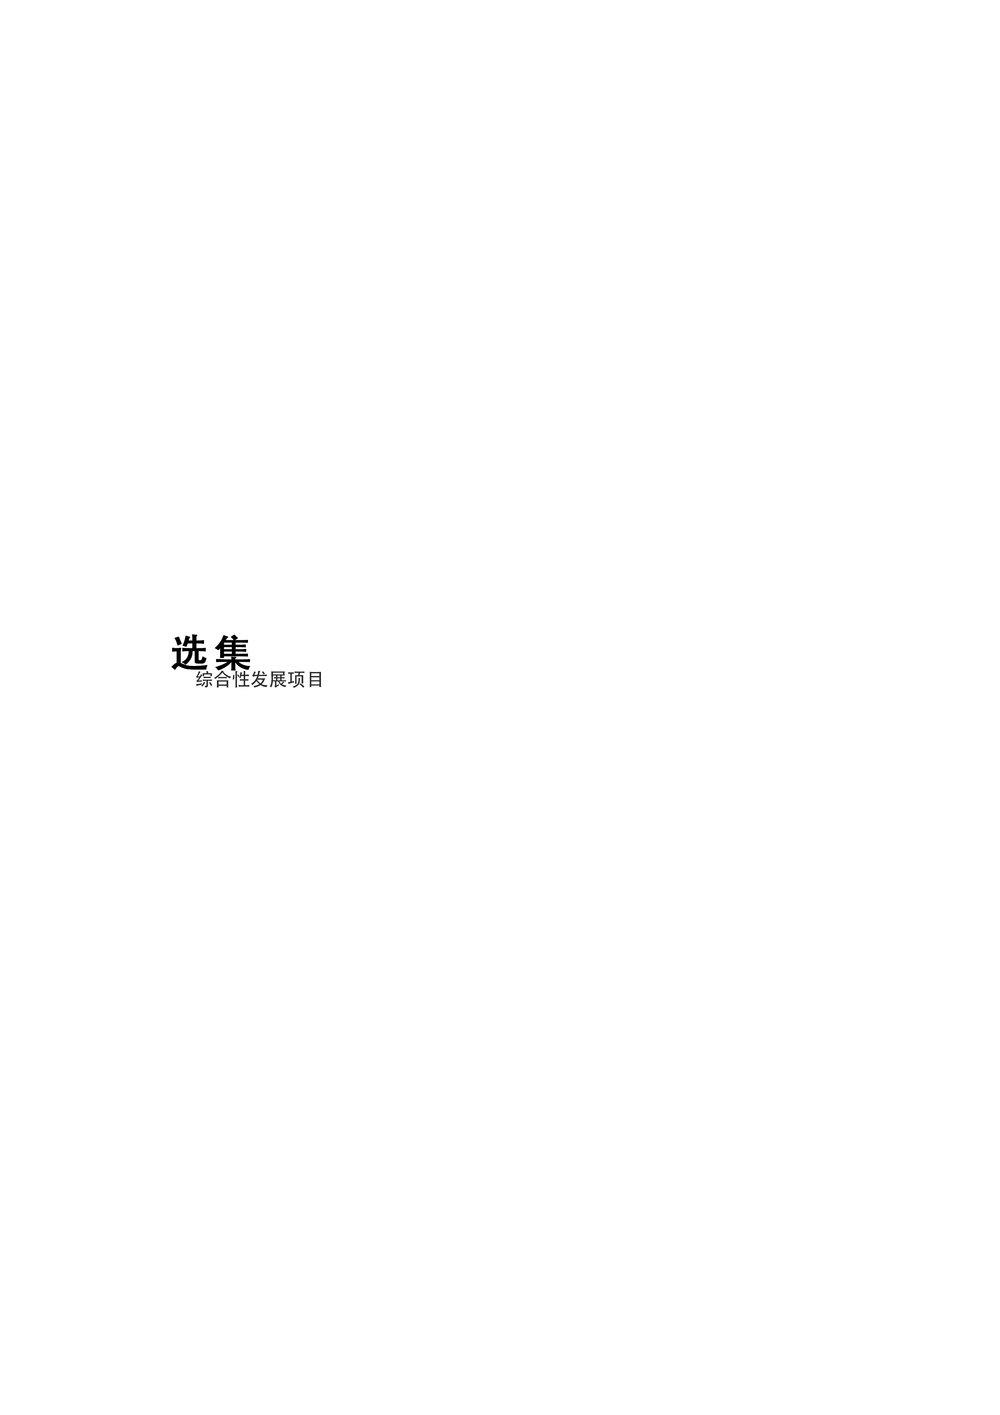 03_Title_cn.jpg